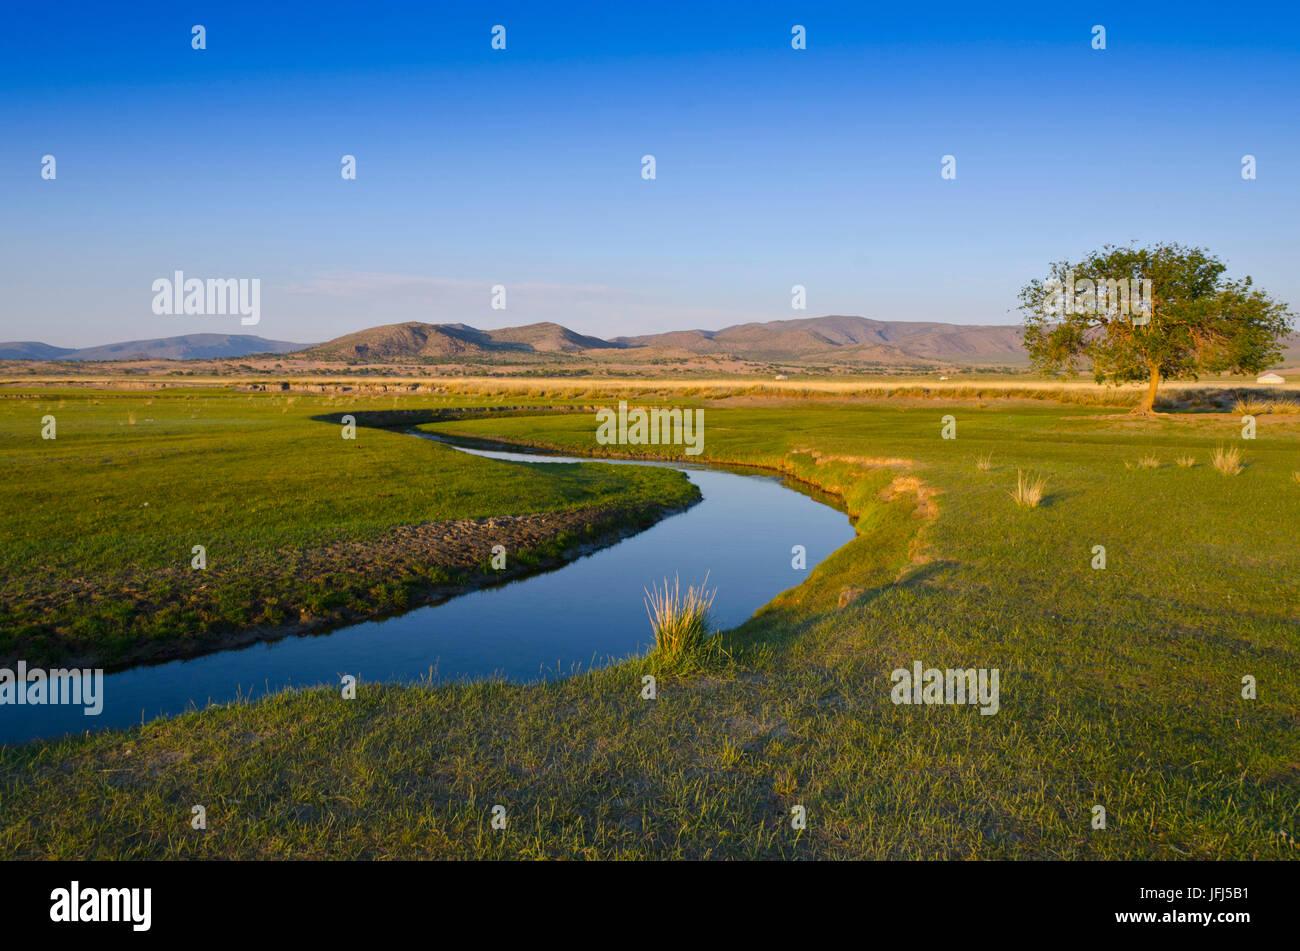 Mongolei, Zentralasien, Camp in der Steppe Landschaft des Gurvanbulag, Fluss Stockbild